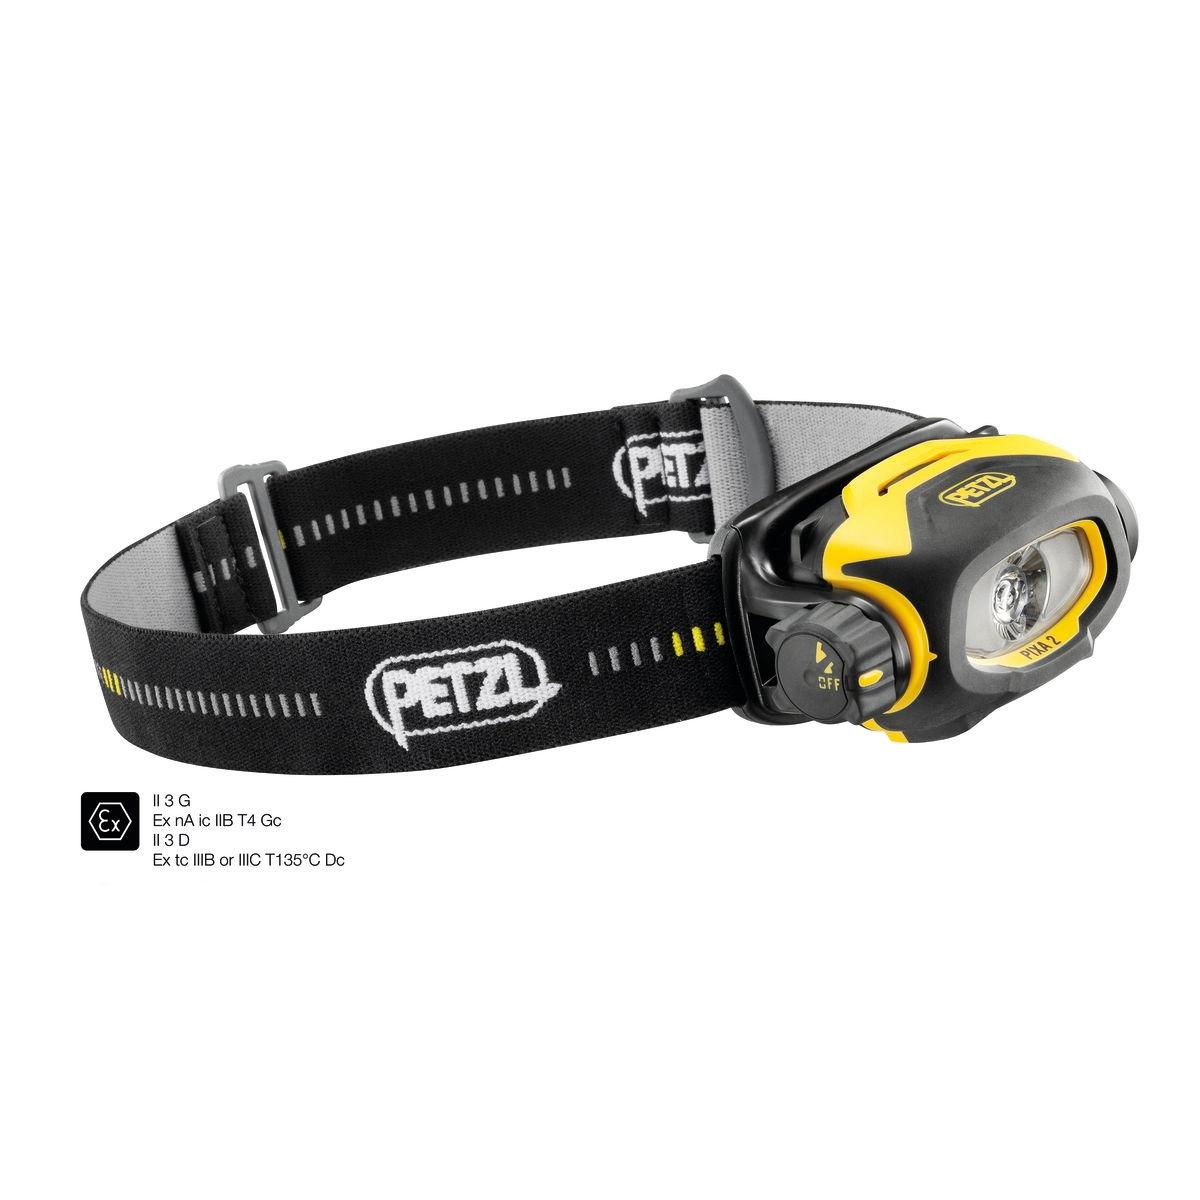 Petzl Pixa 2 - Atex Zone 2/22 - Hoofdlamp